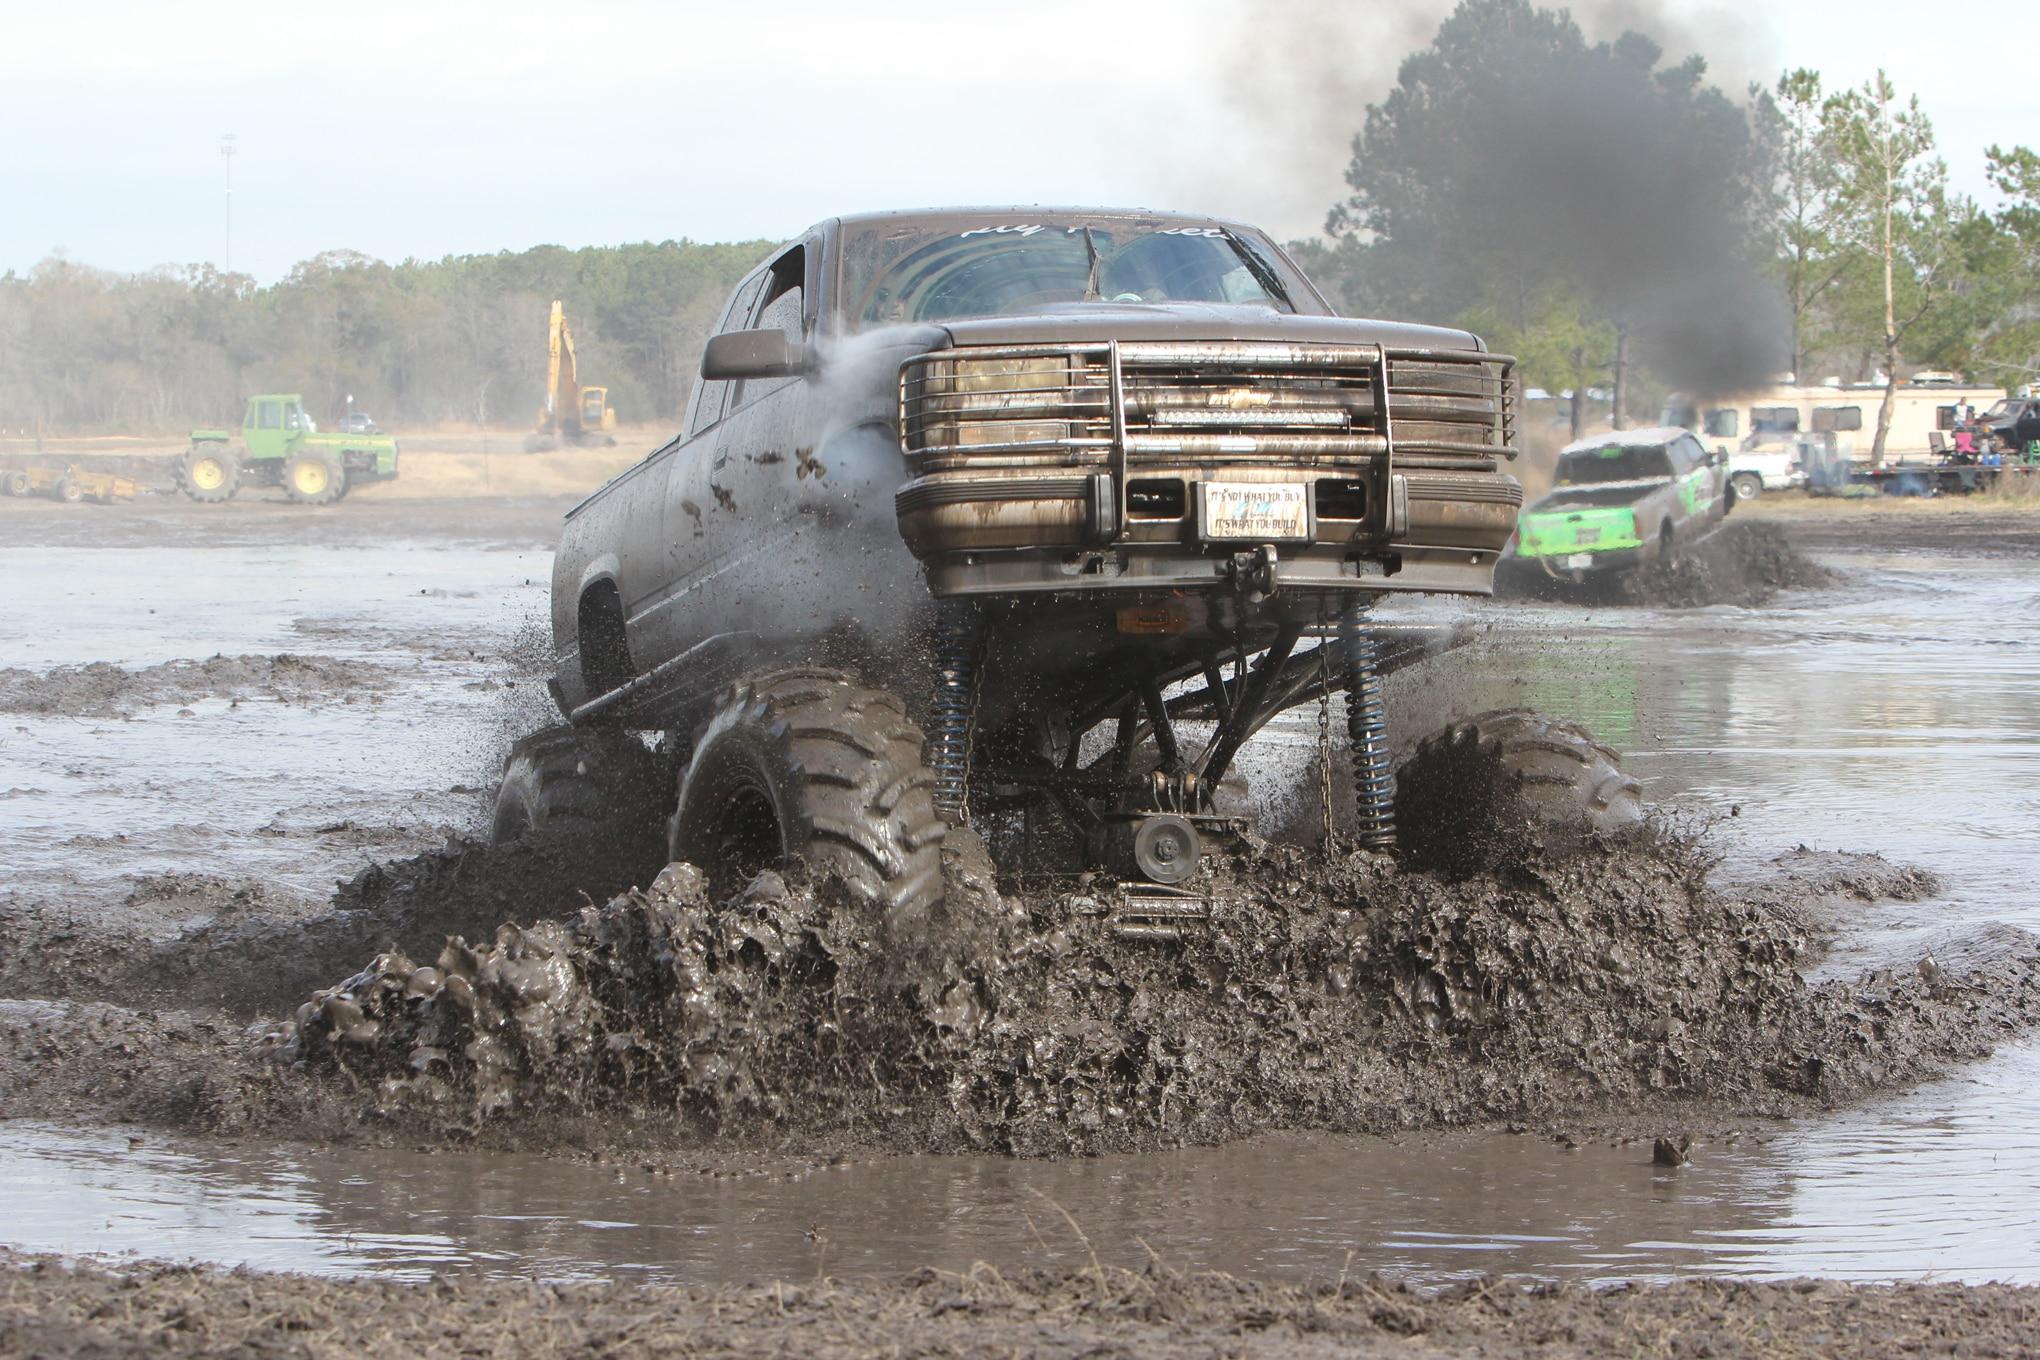 071 south berlin mud ranch 2016